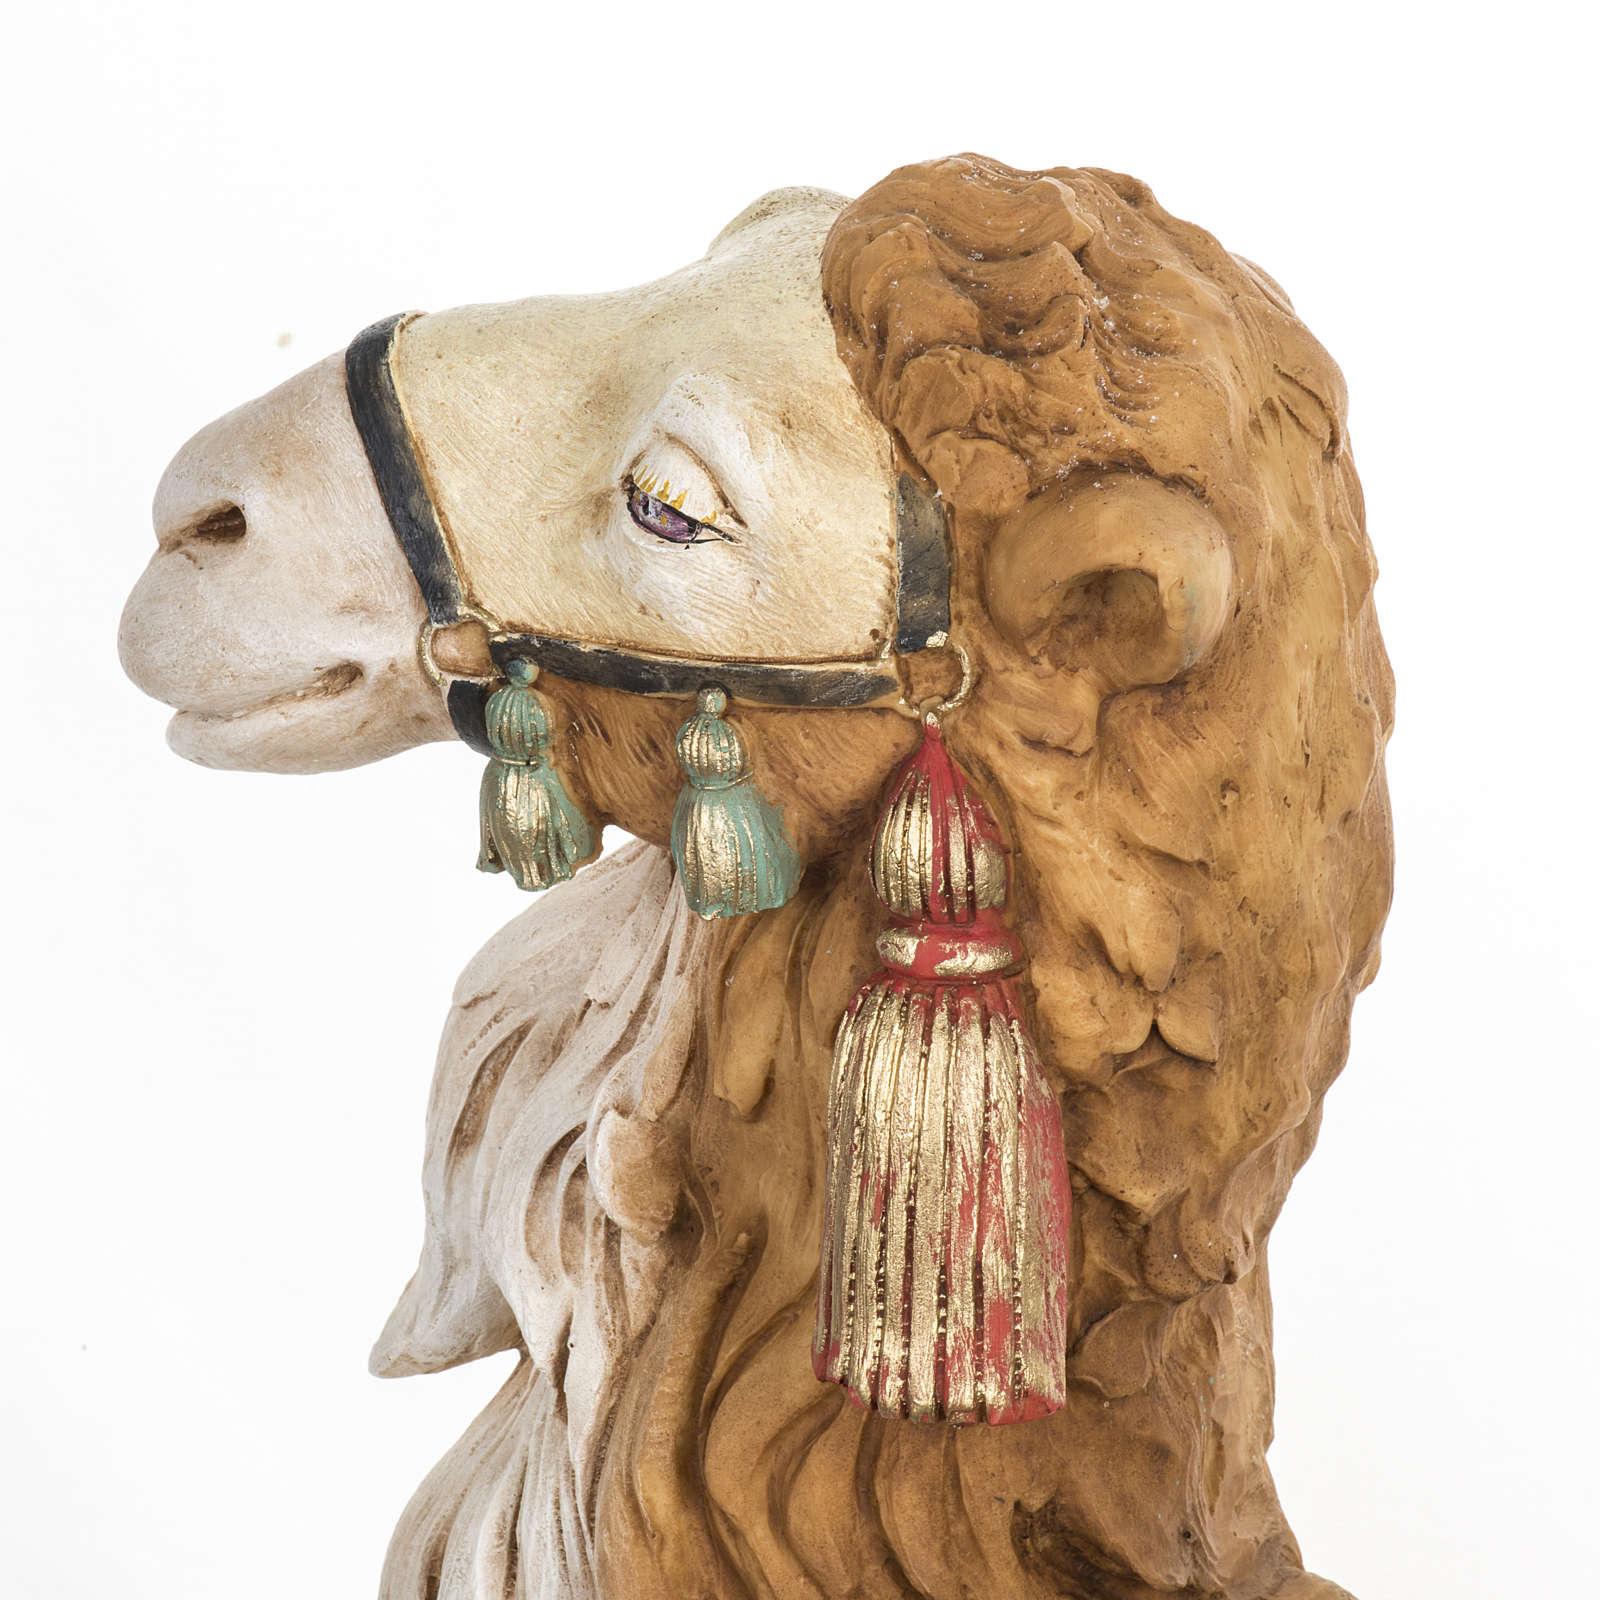 Cammello presepe Fontanini 65 cm resina 3